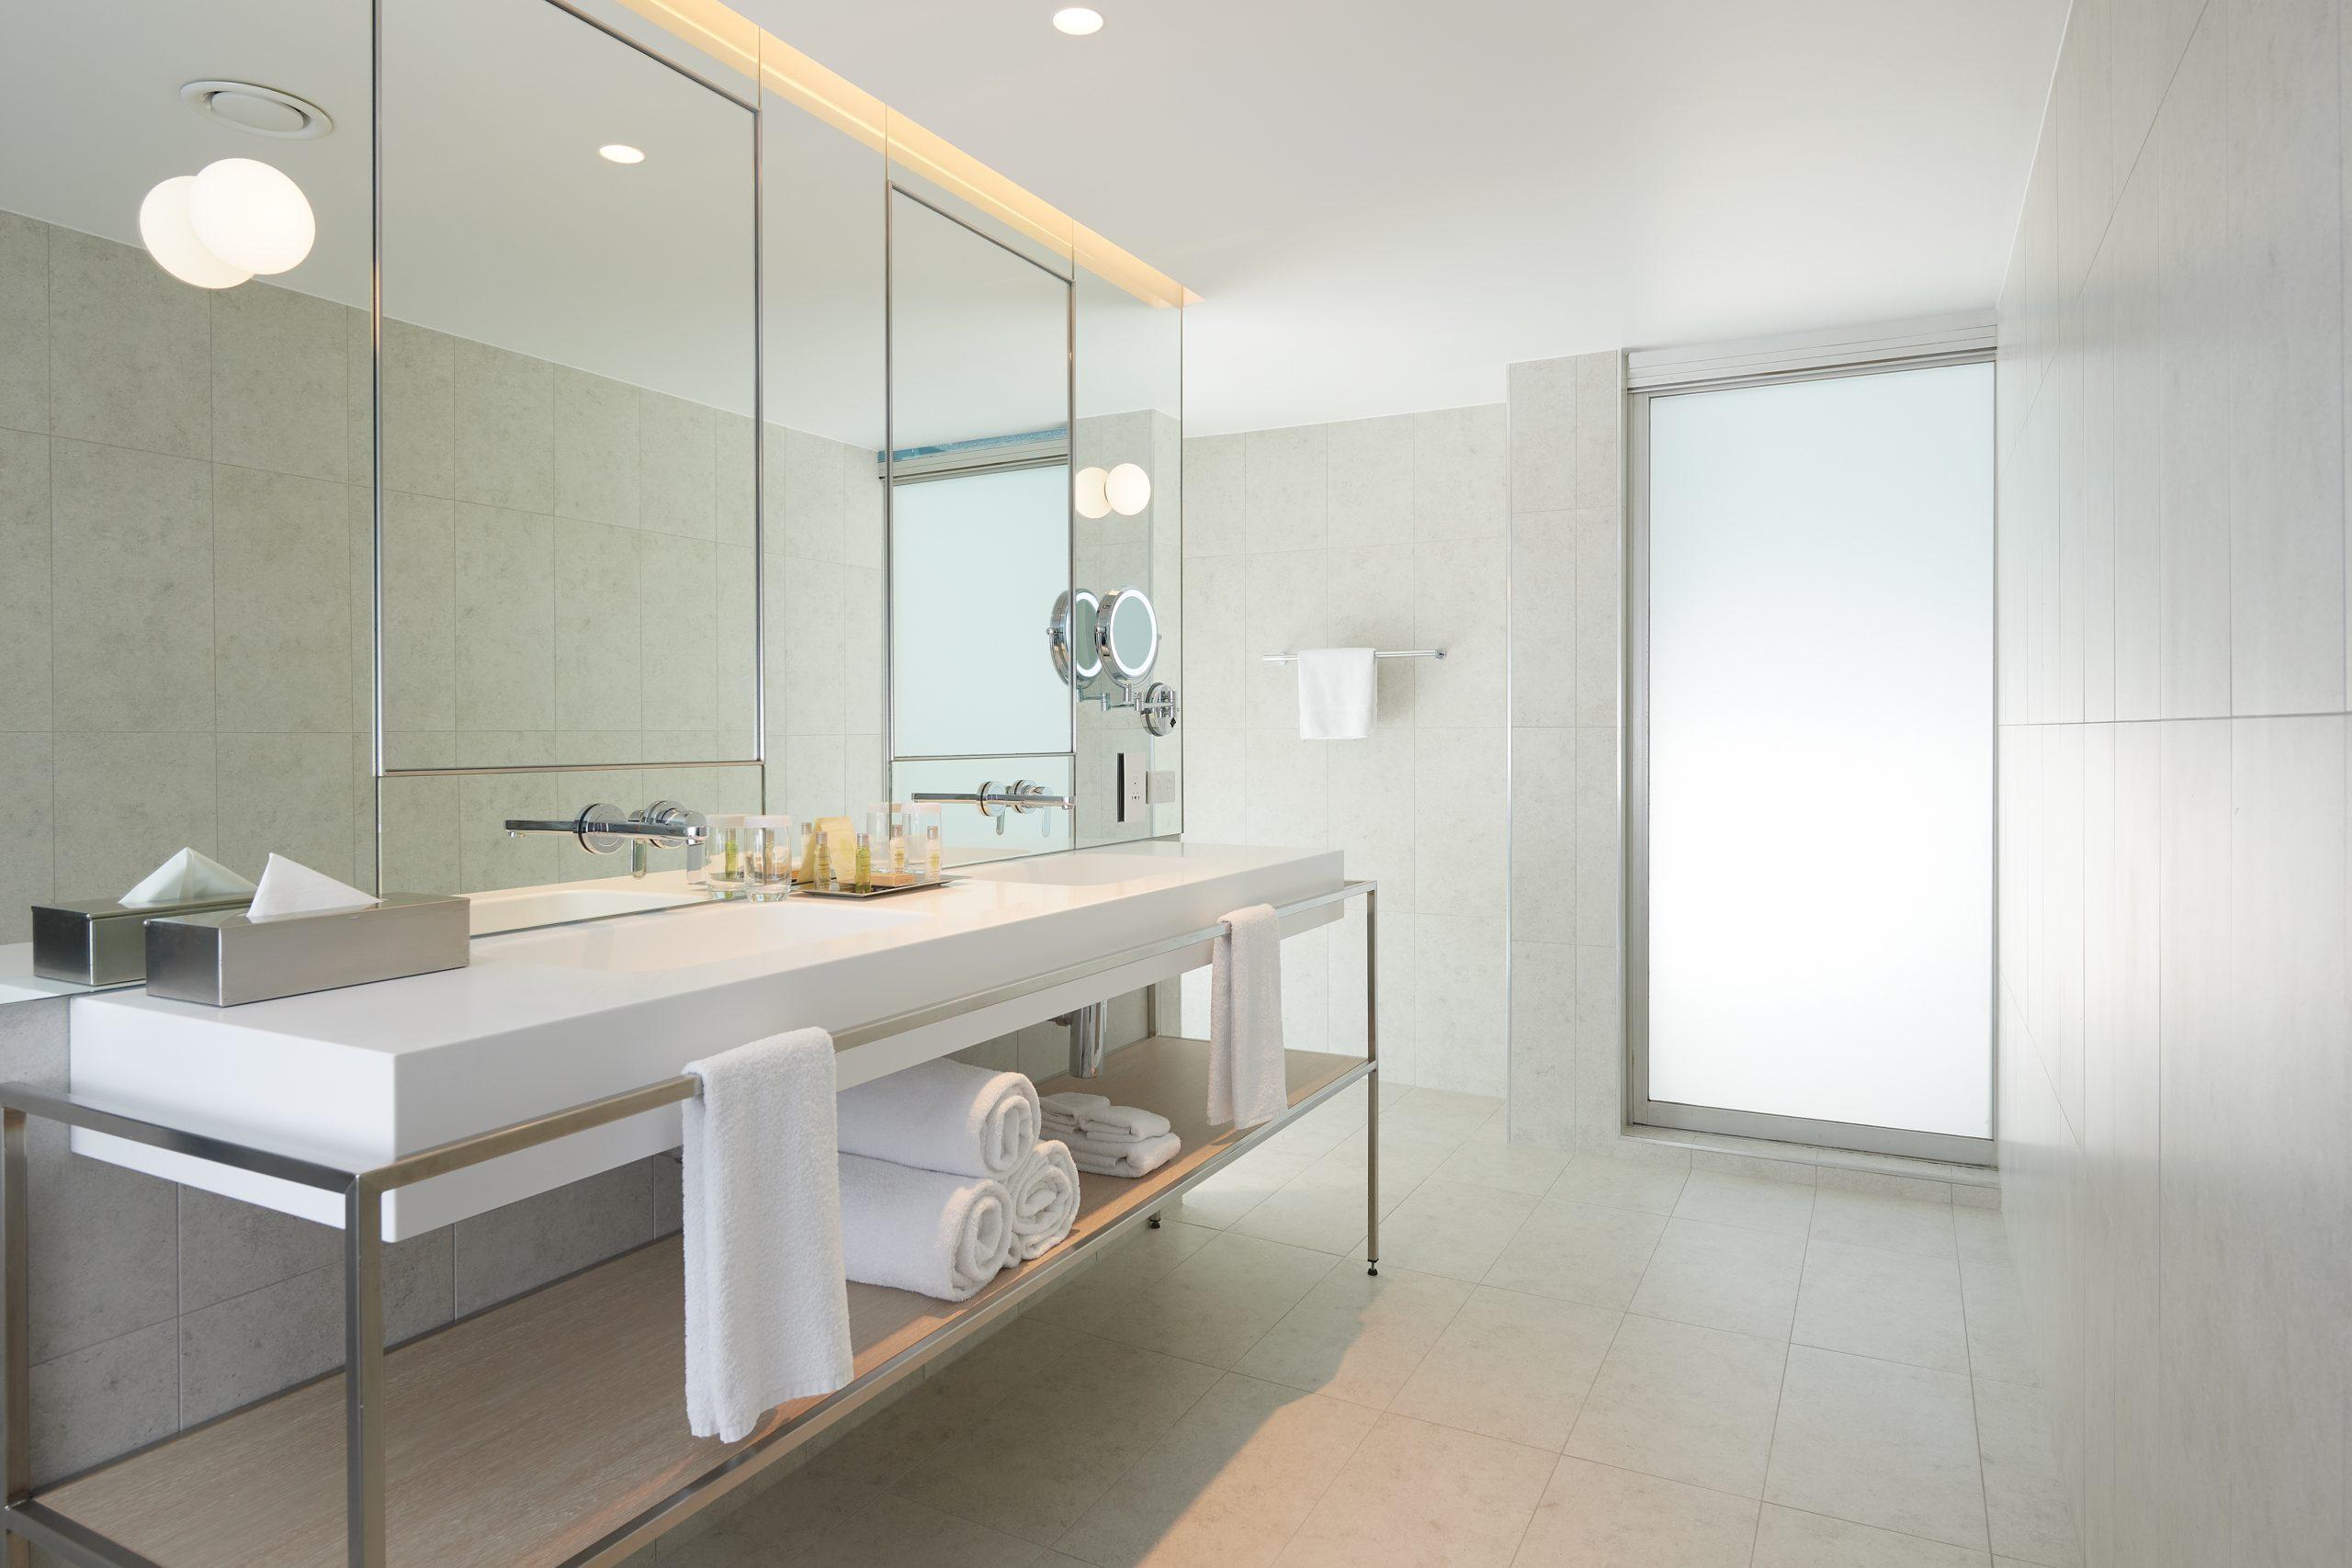 PARMELIA HILTON_New King Executive Bathroom